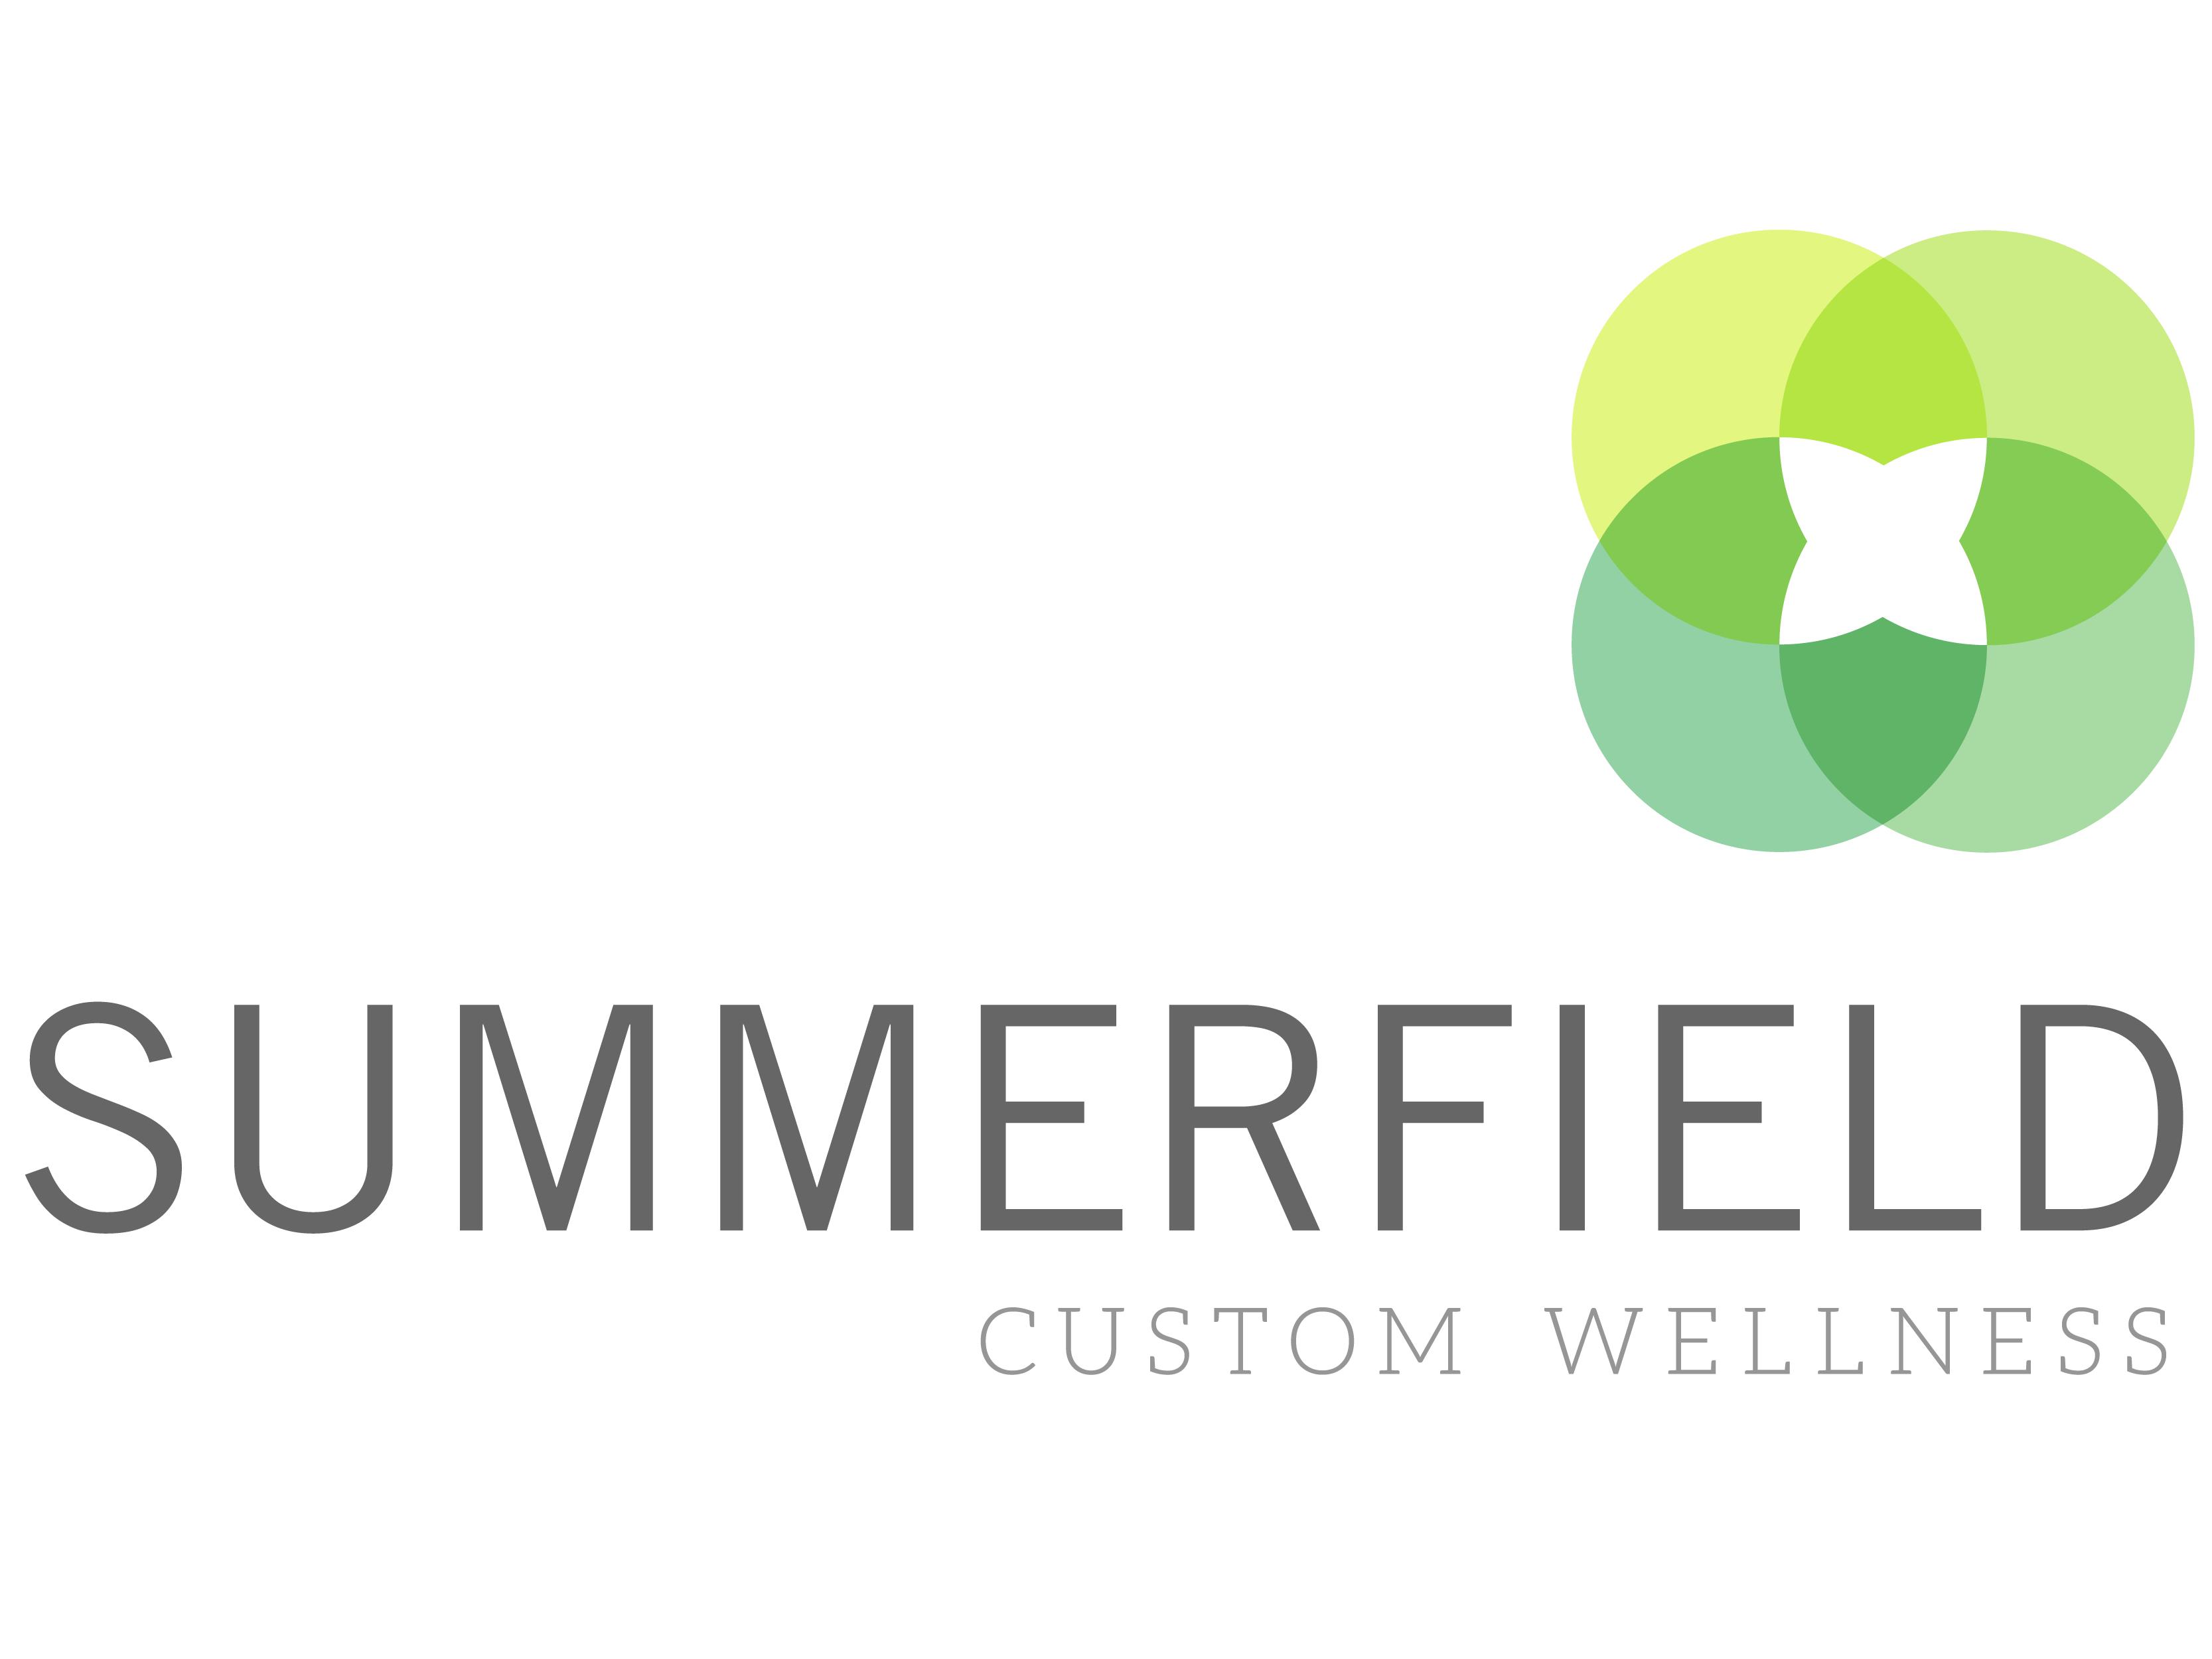 Summerfield Custom Wellness